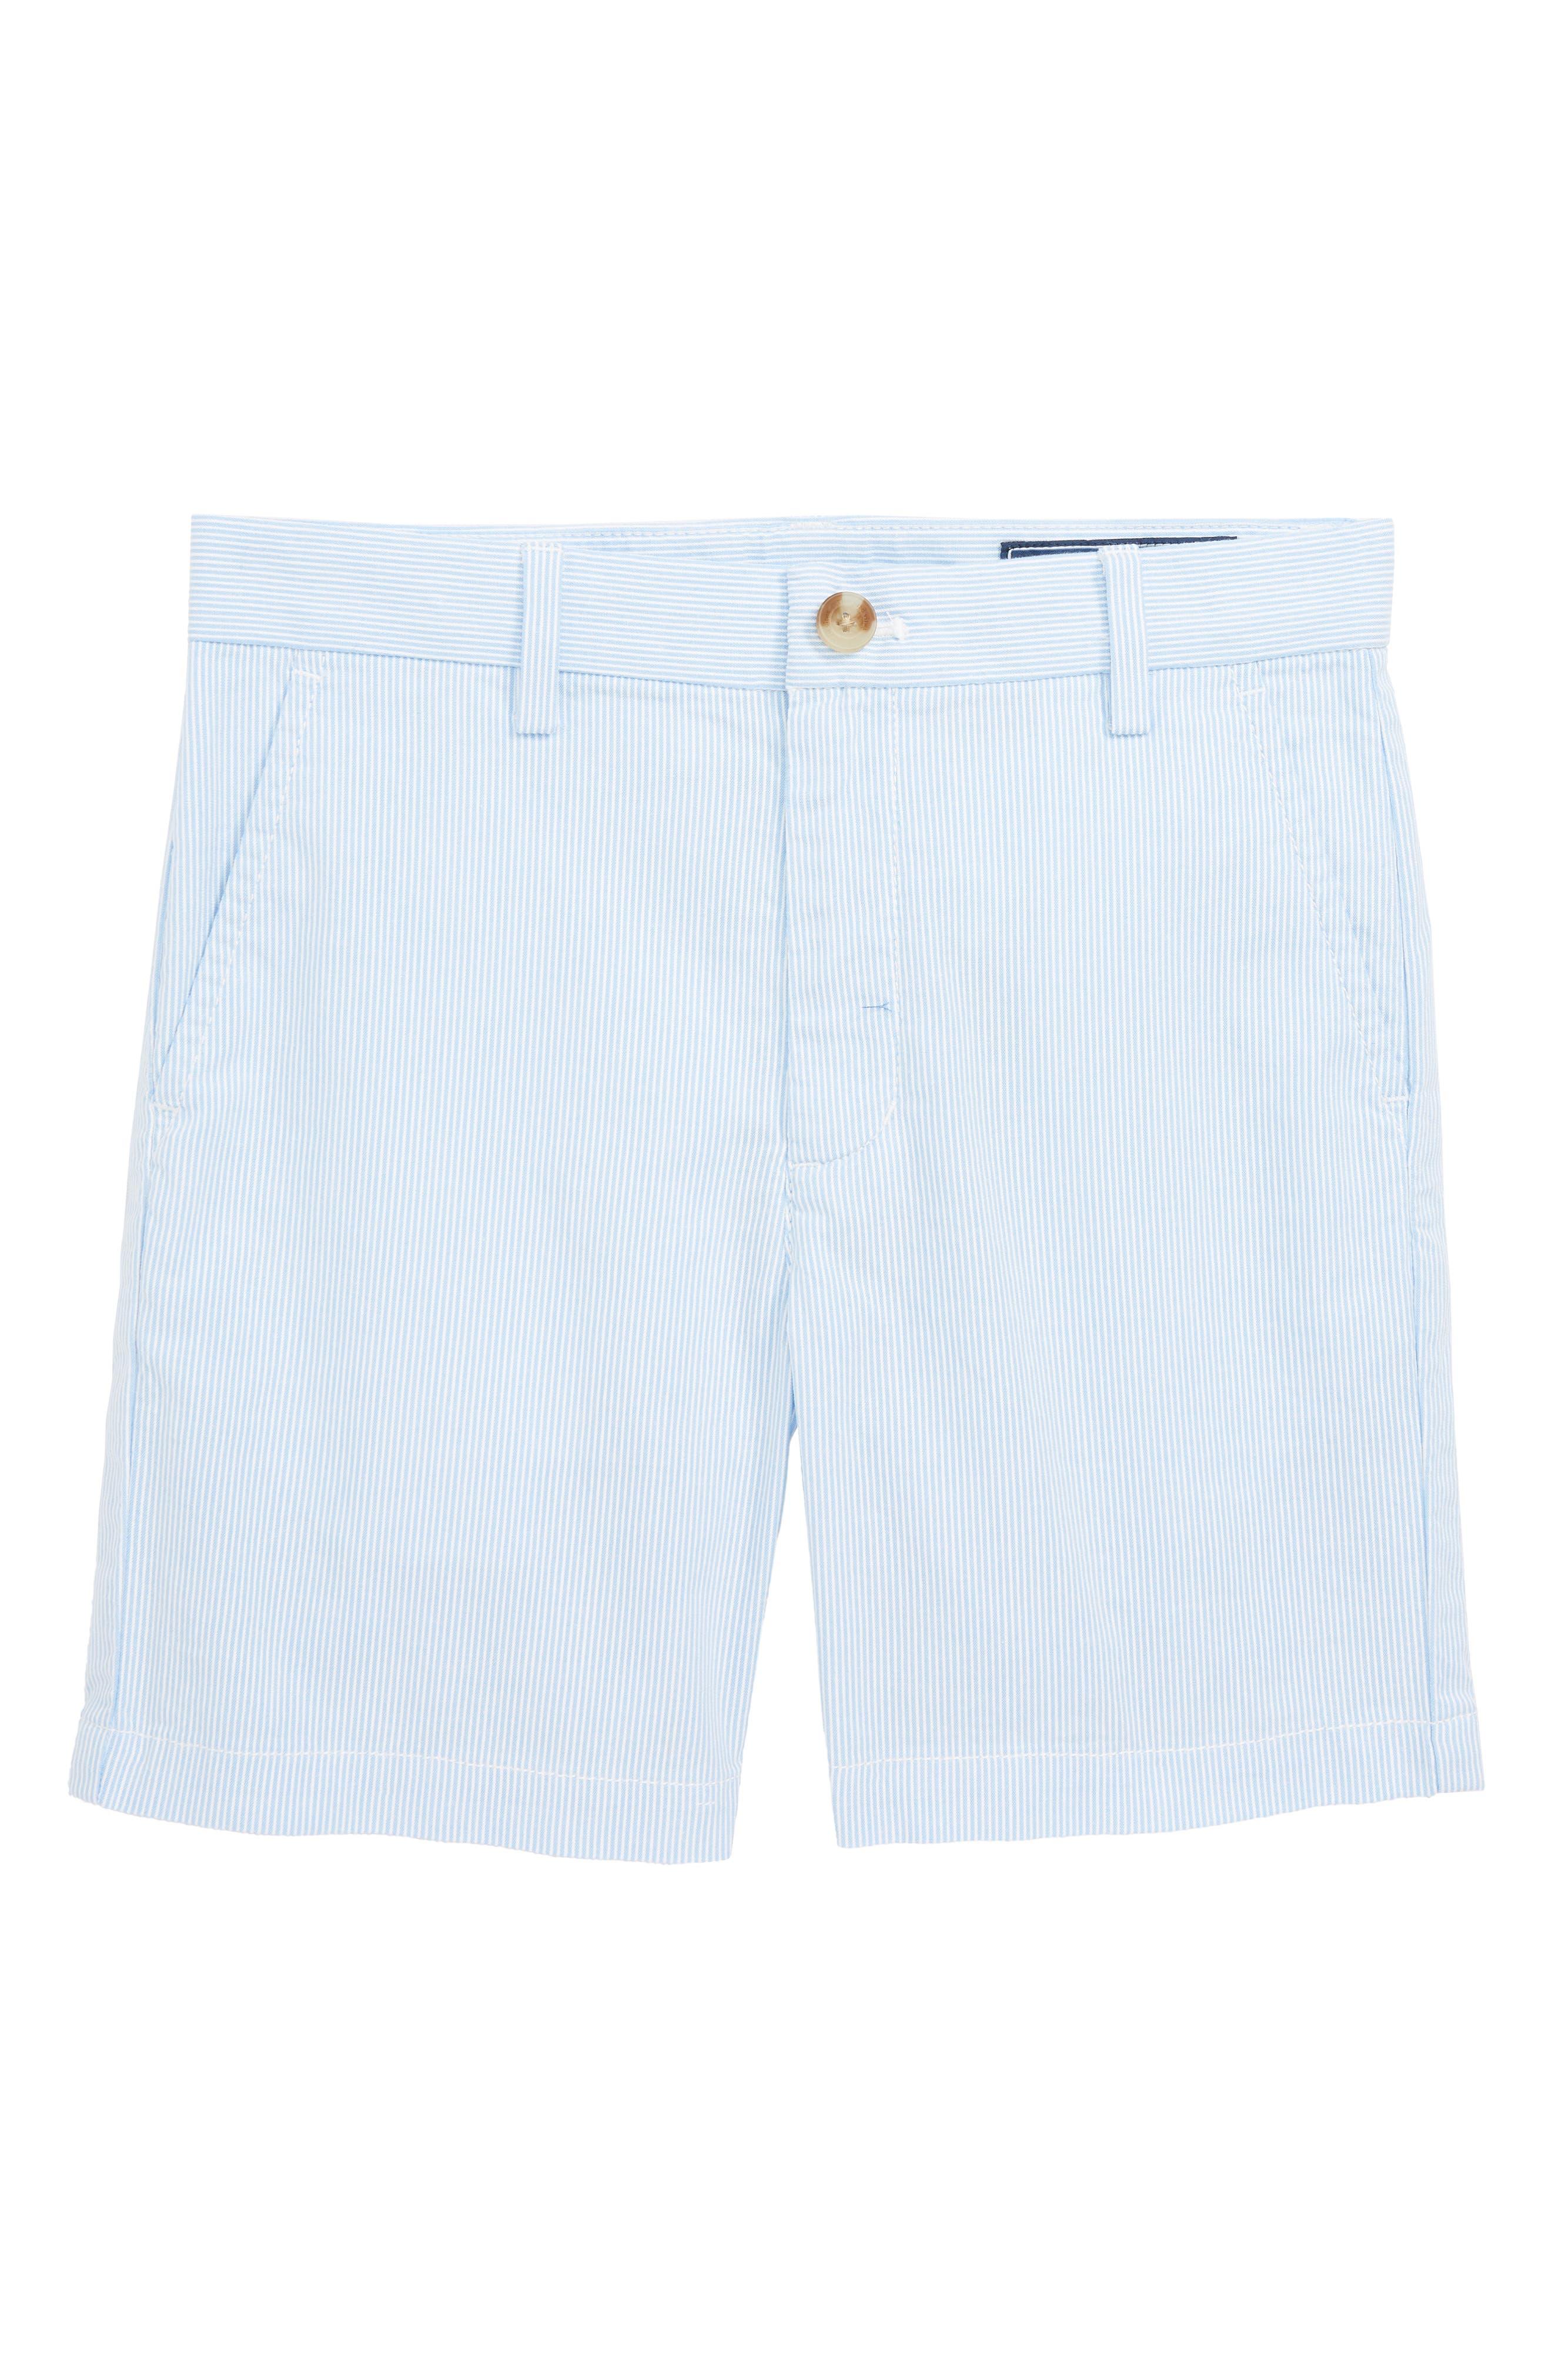 Pincord Stripe Breaker Shorts,                         Main,                         color, Ocean Breeze